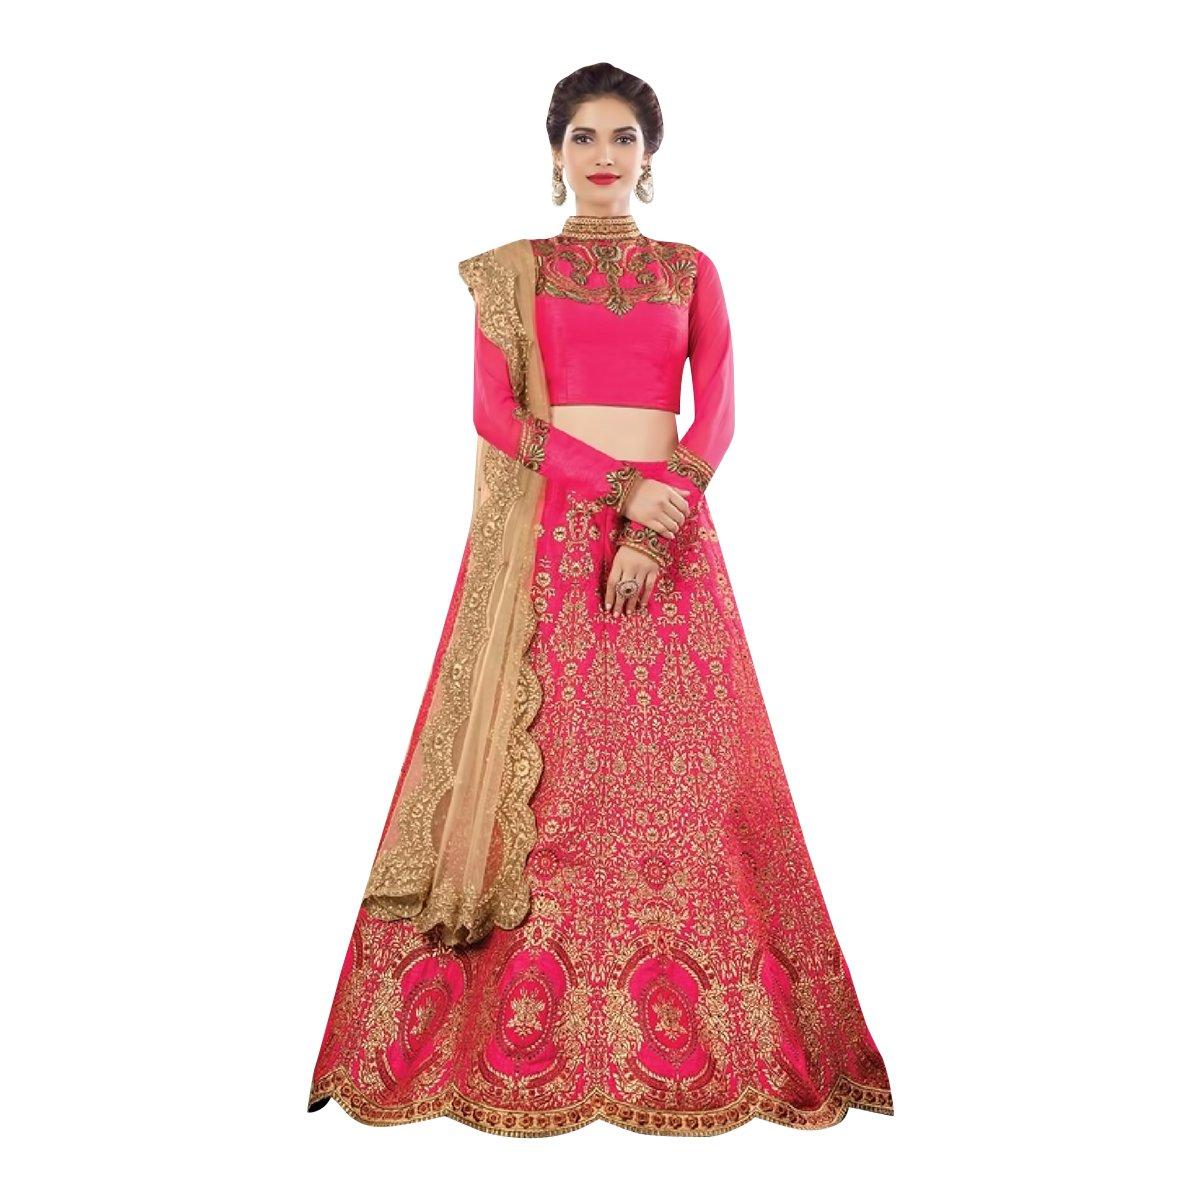 3f7c847b5ff Wedding Indian Women Dress Hijab Straight Lehenga Choli Salwar Kameez Suit  Party Wear 502  Amazon.co.uk  DIY   Tools